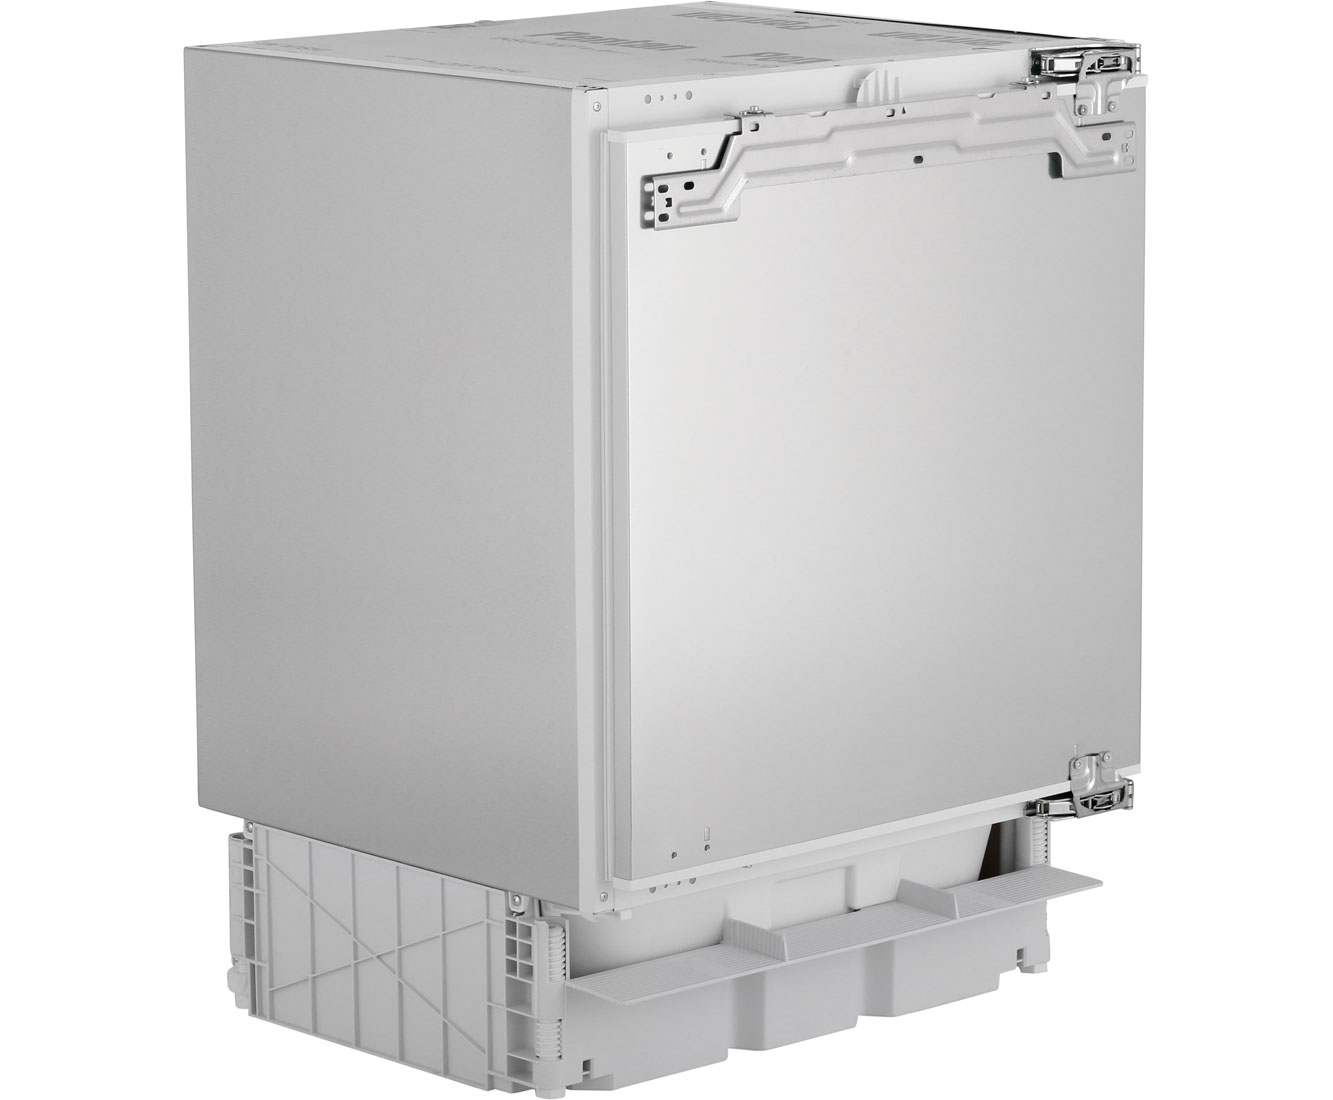 Siemens Mini Kühlschrank : Siemens ku la unterbau kühlschrank mit gefrierfach er